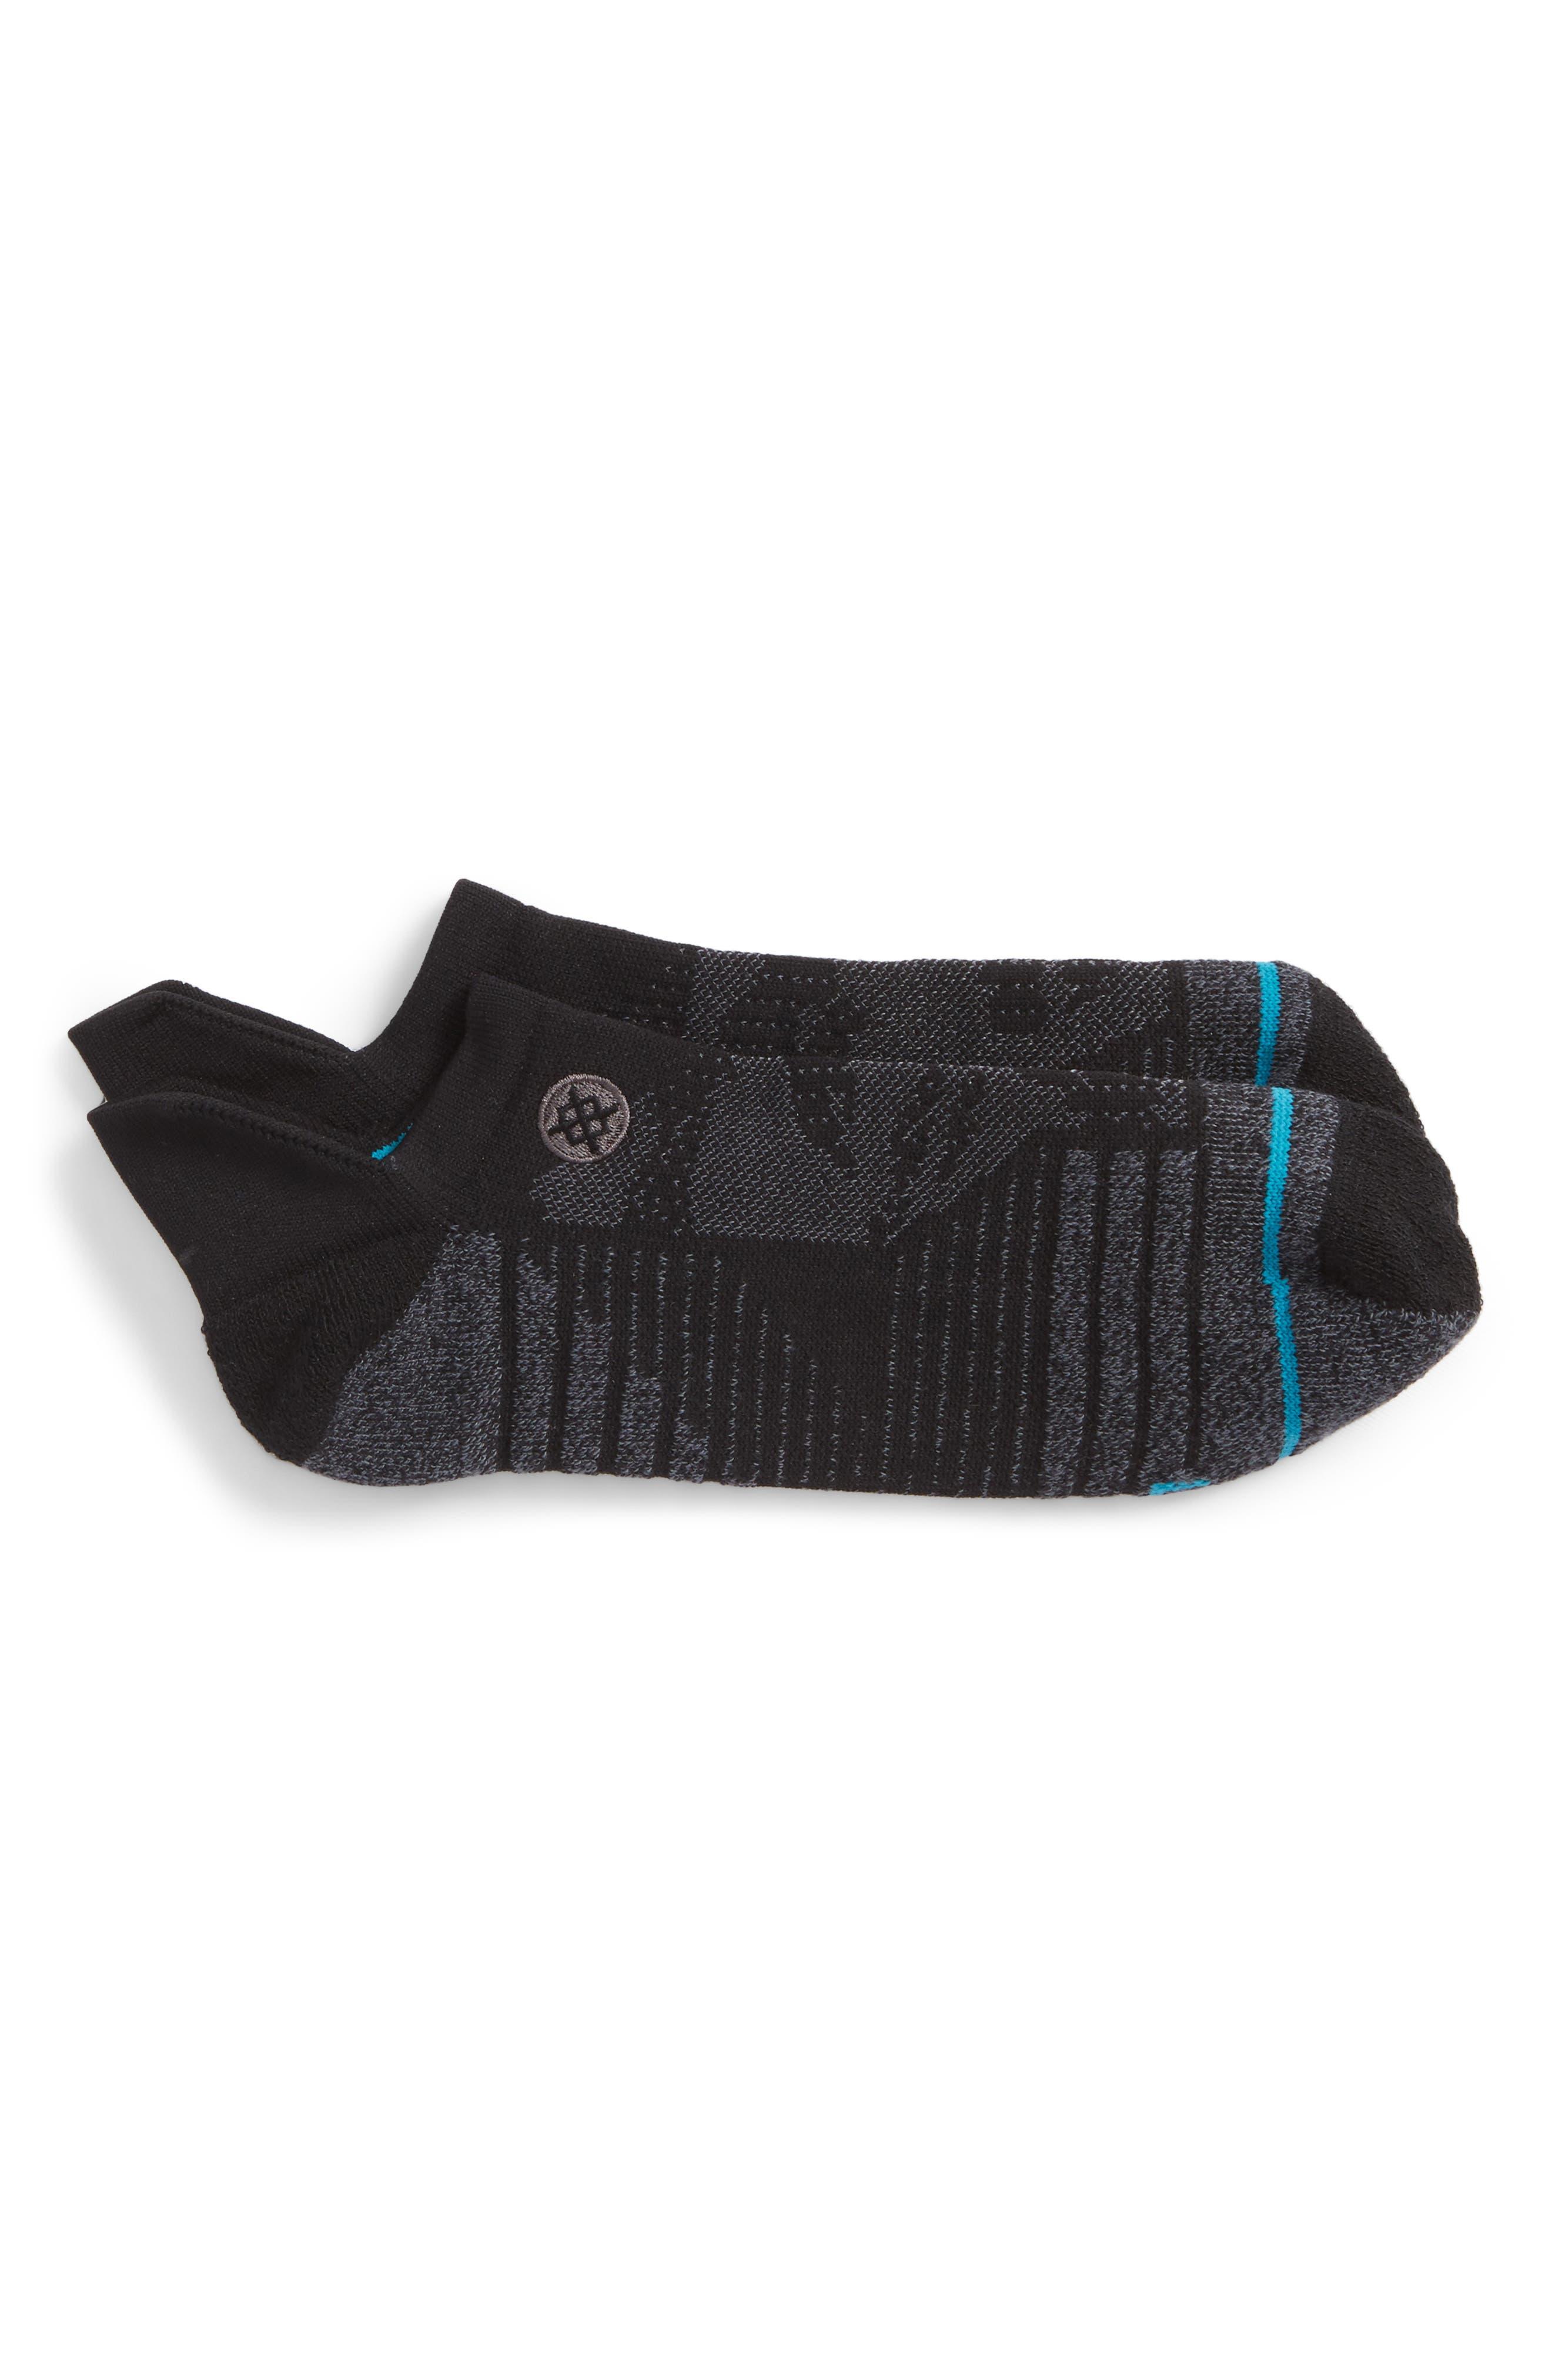 Stance Training Uncommon Solids Tab Socks